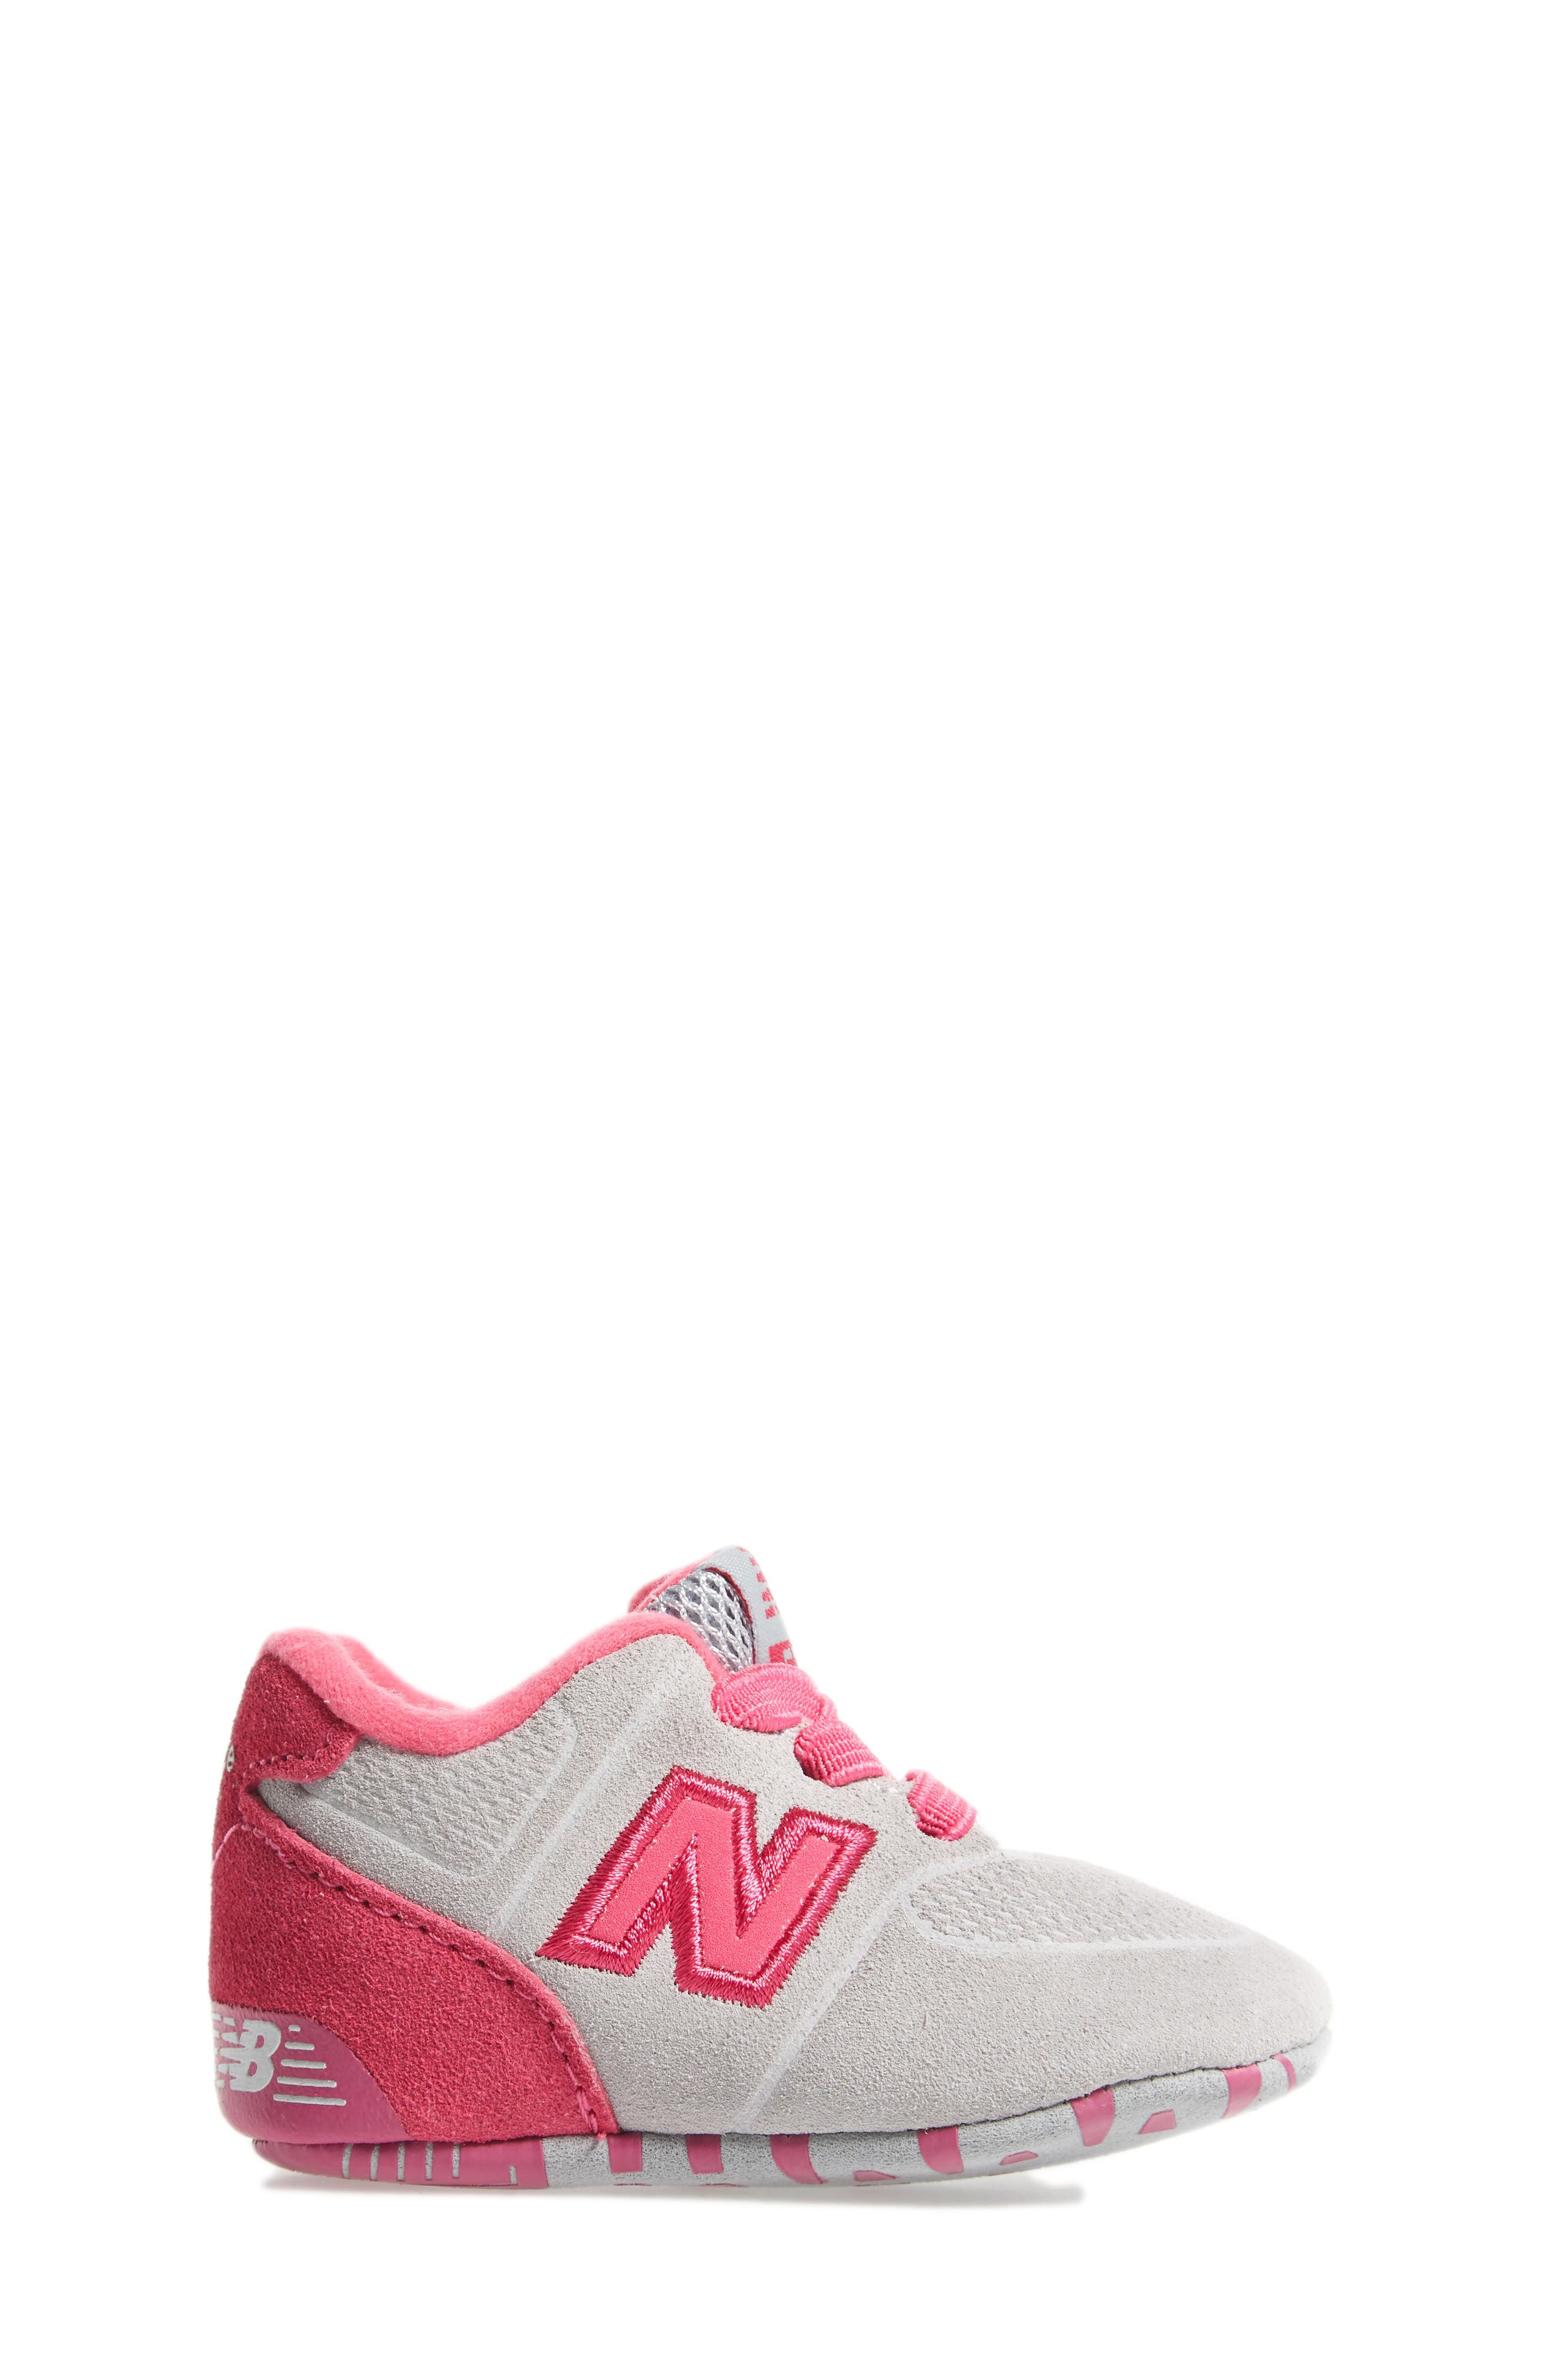 574 Crib Shoe,                             Alternate thumbnail 3, color,                             Pink/ Grey